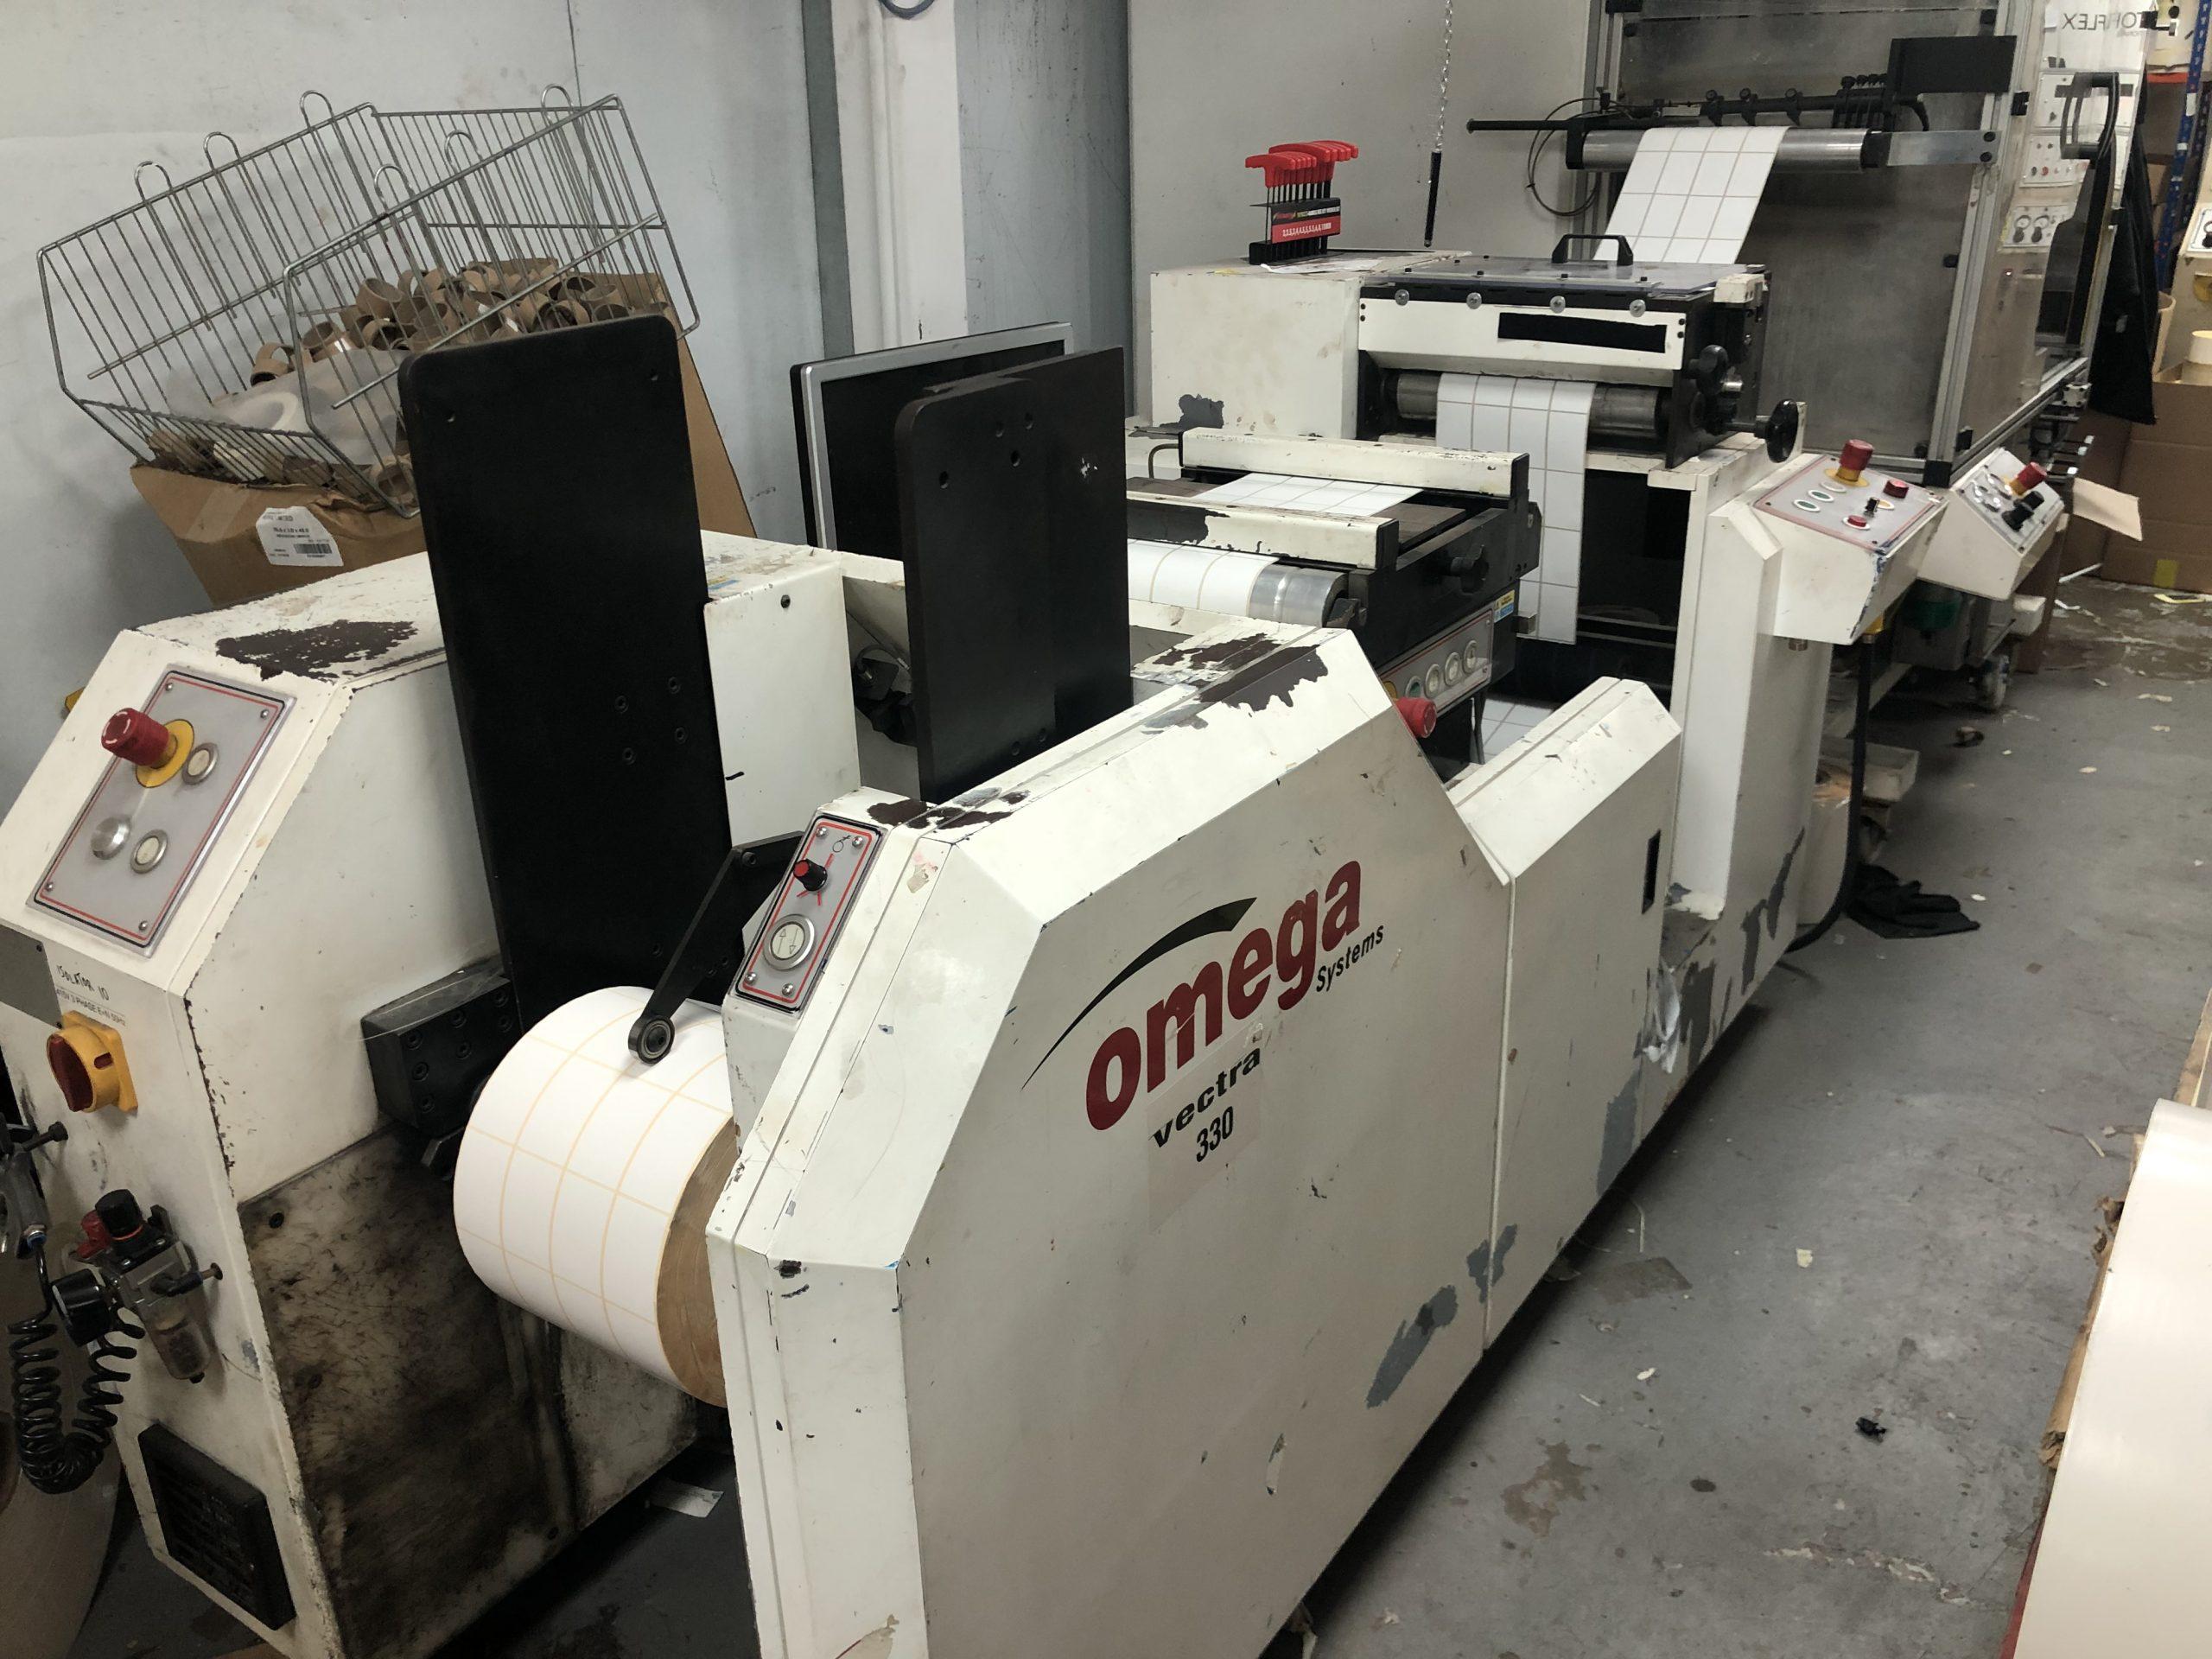 ABG Omega 330 + ABG Vectra SGTR 330 - Used Flexo Printing Presses and Used Flexographic Equipment-0